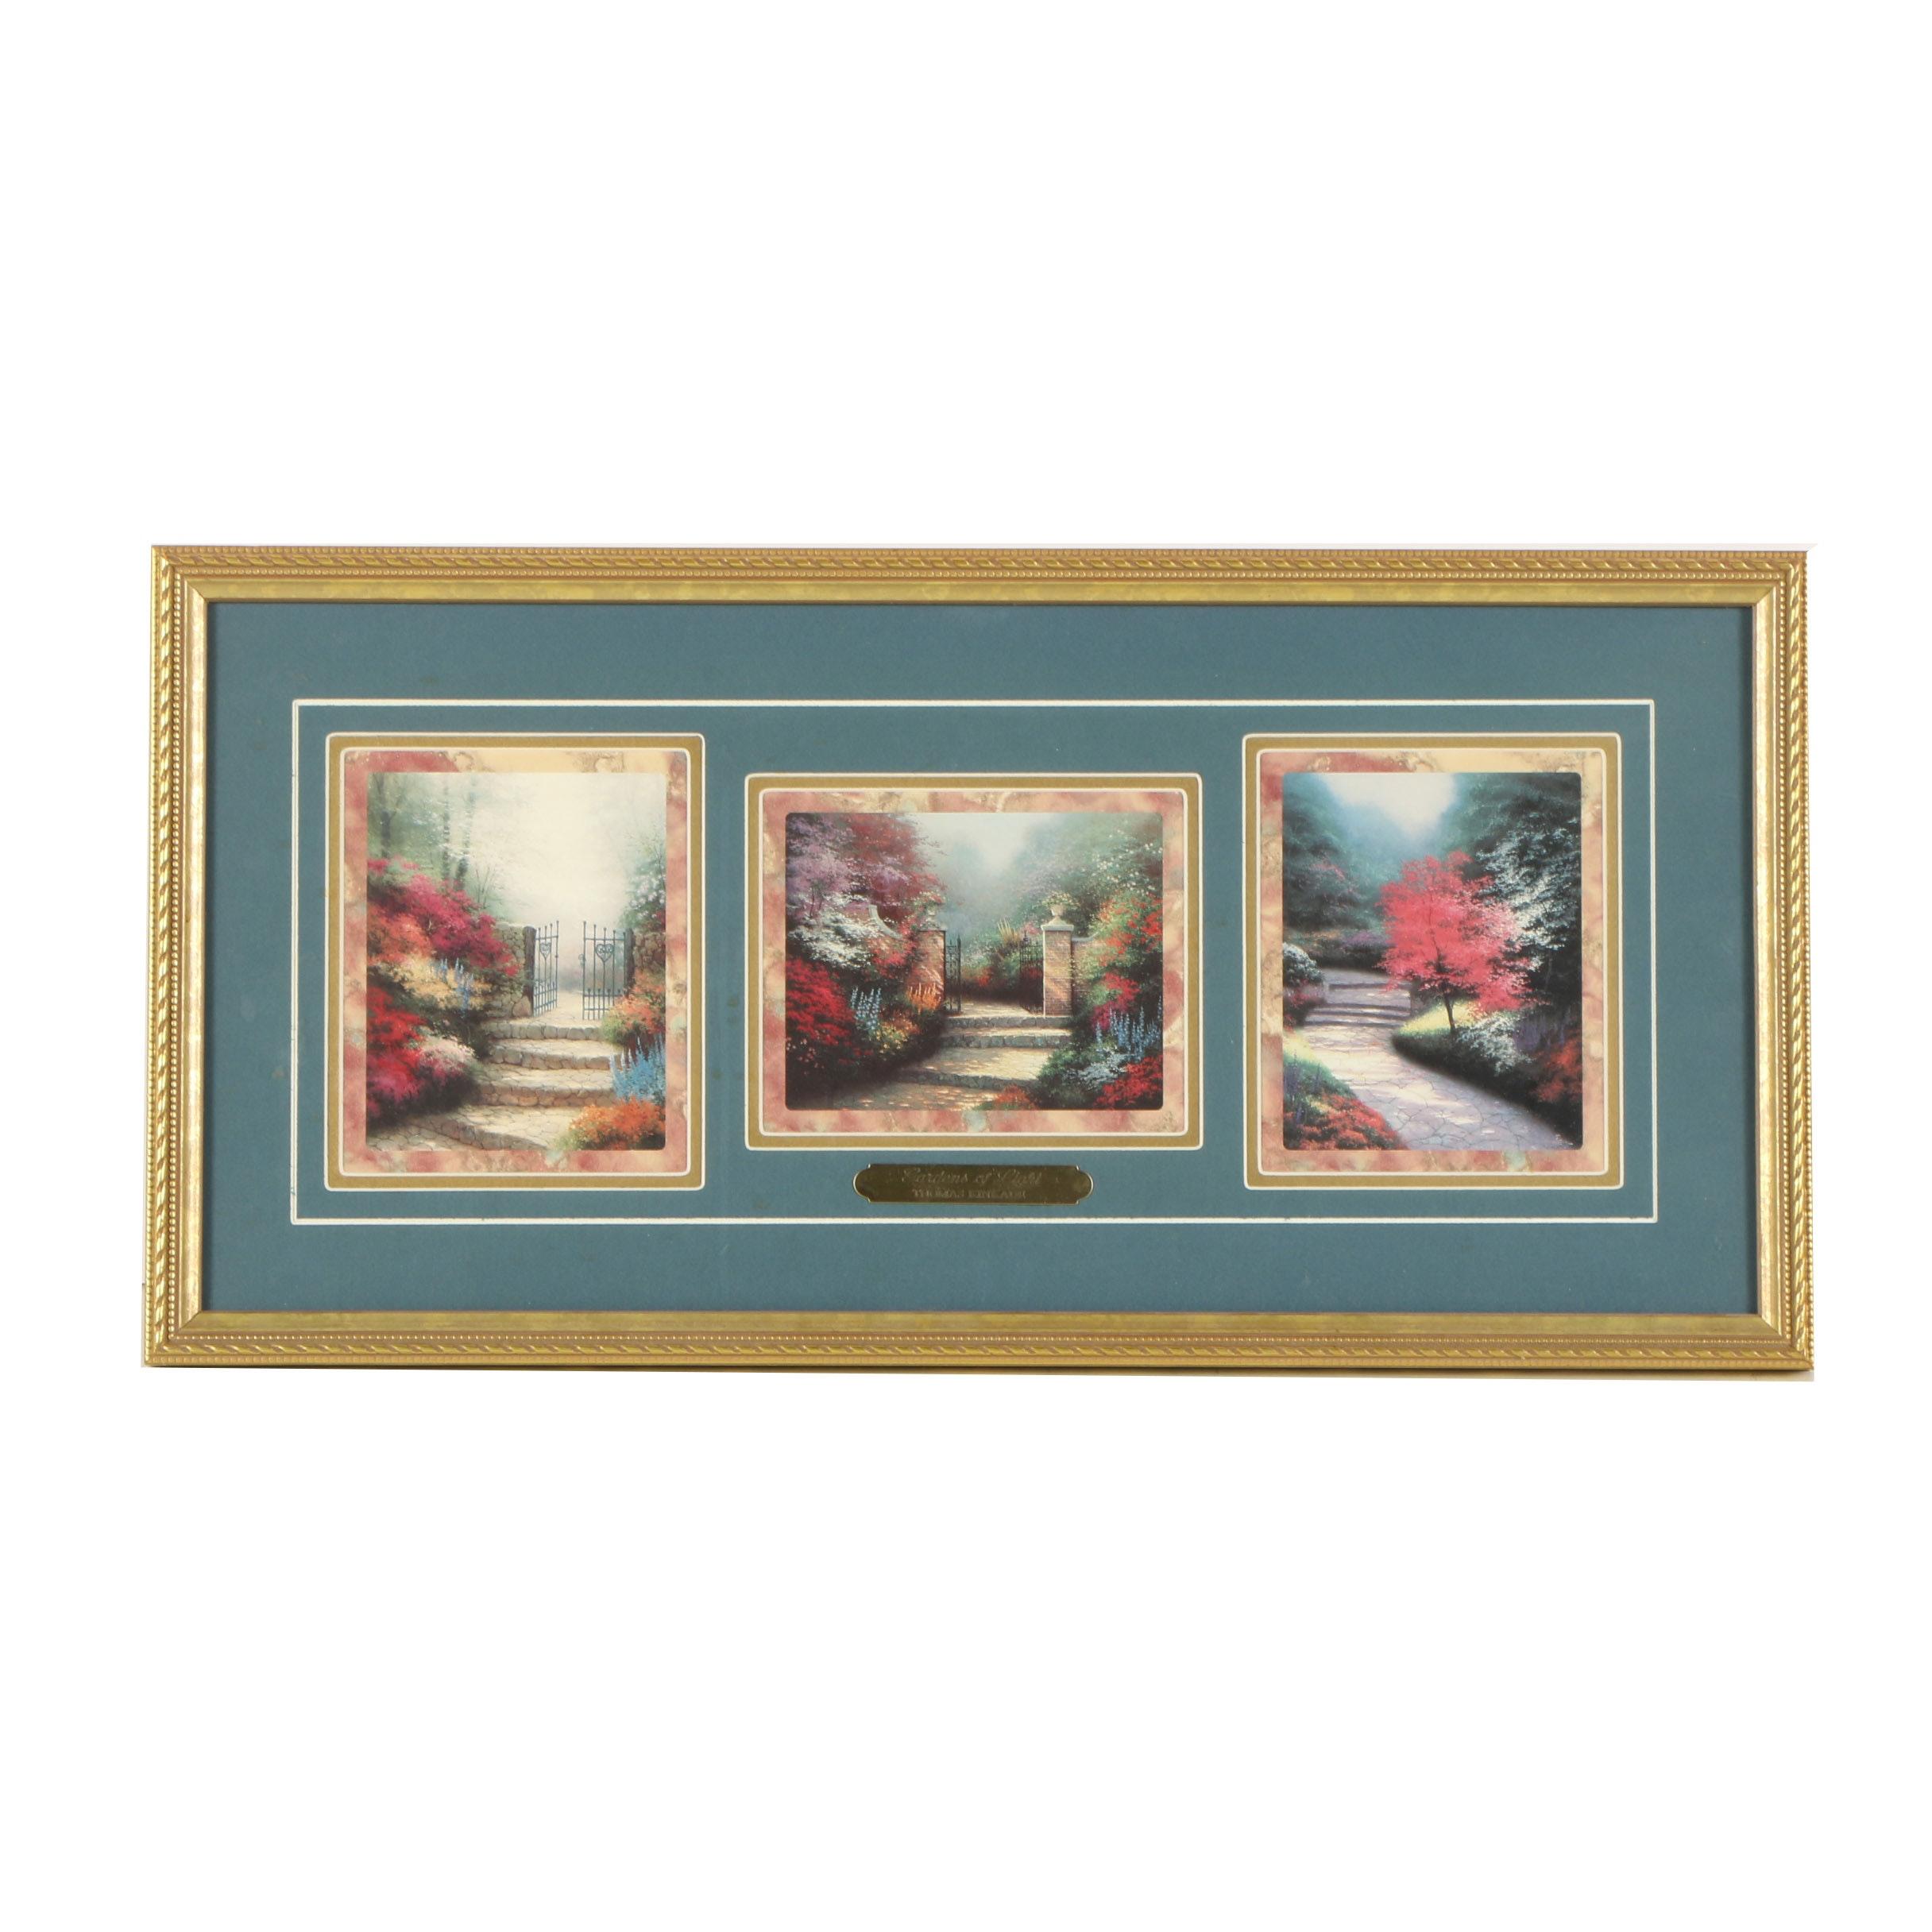 "Thomas Kinkade Offset Lithograph ""Gardens of Light"""